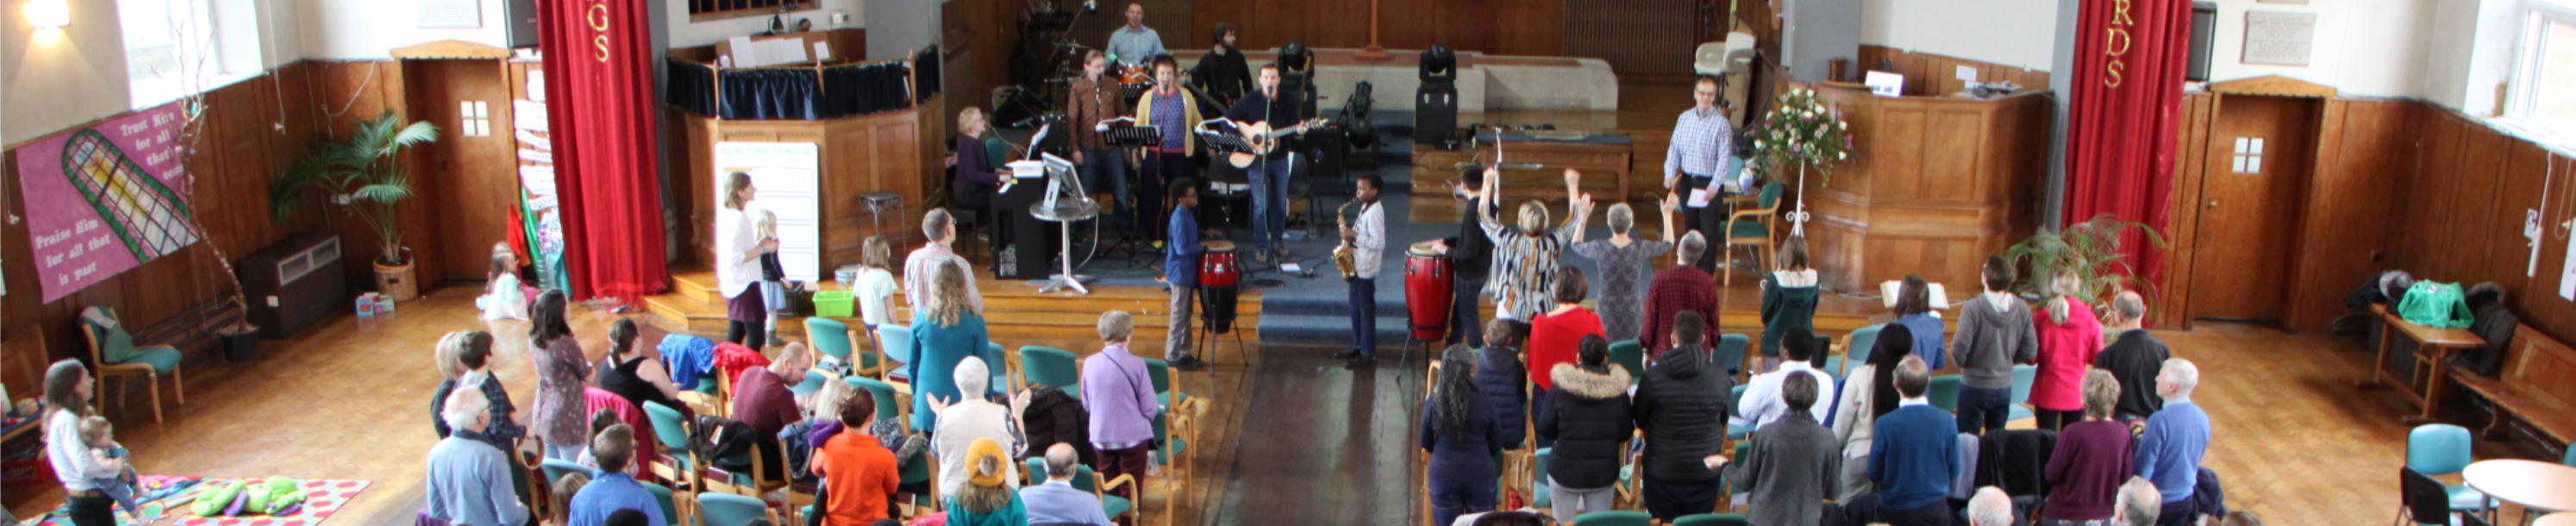 TWBC worship